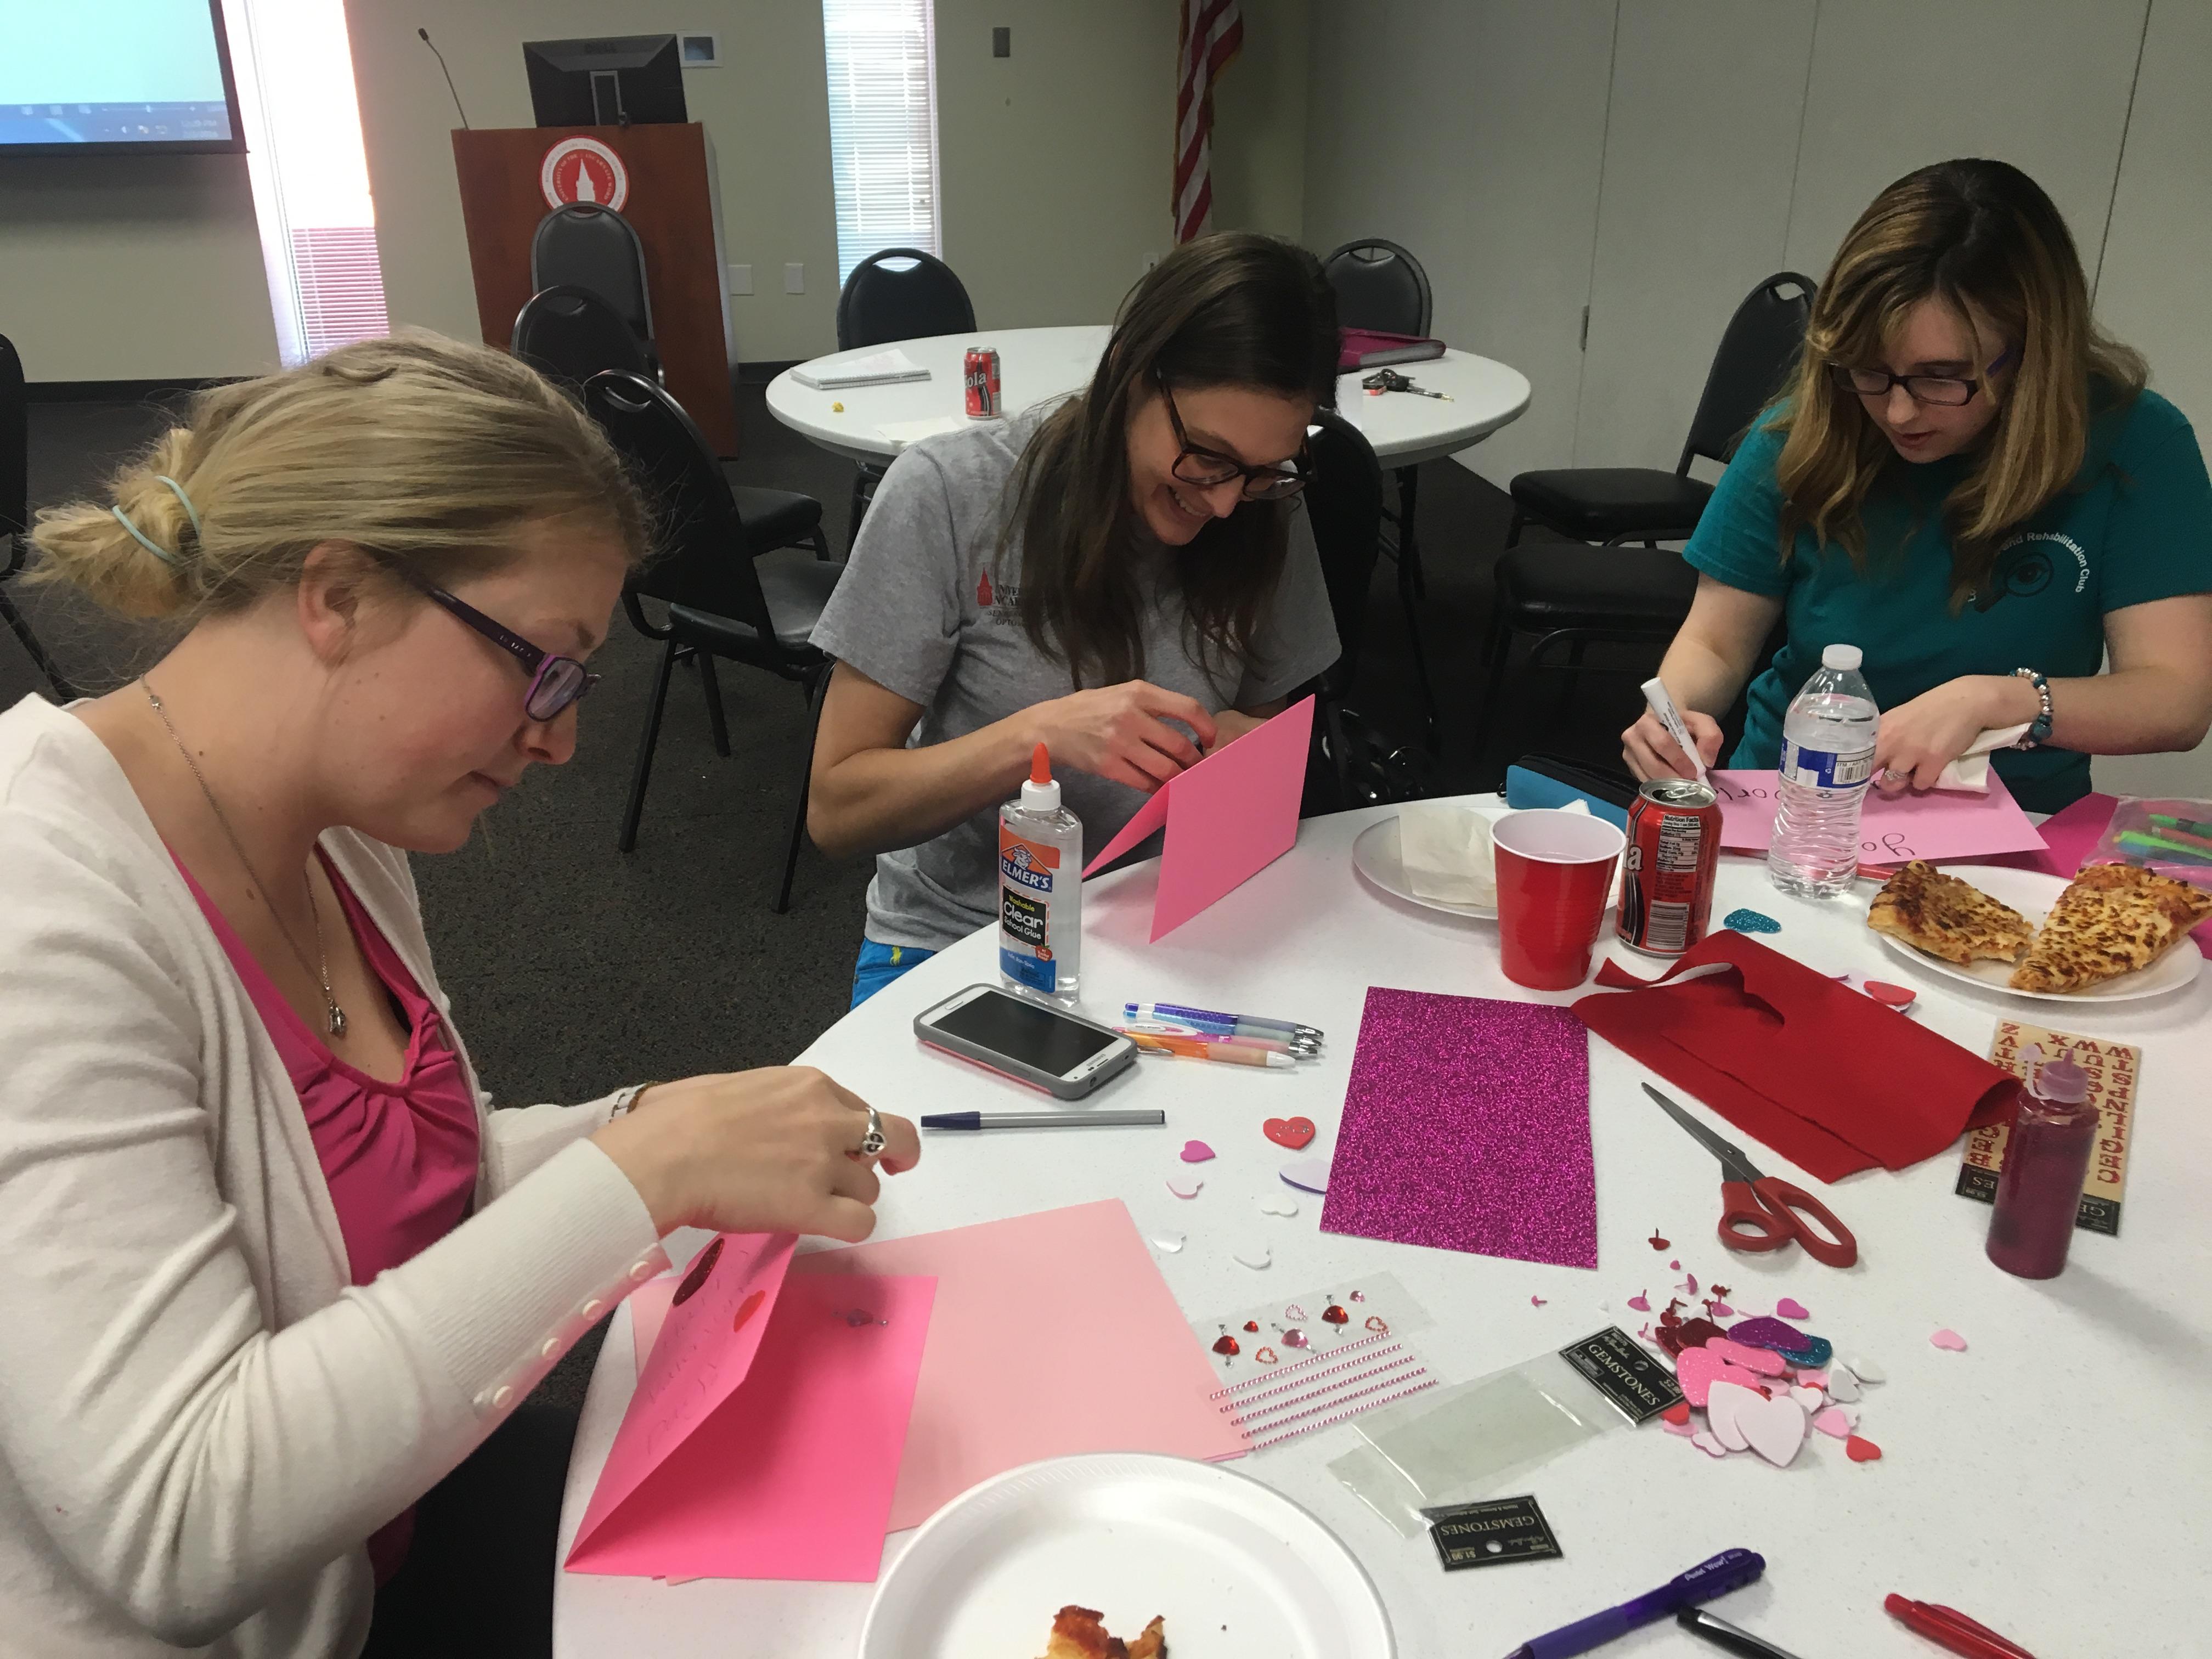 LVR Club Celebrates Valentine's Day